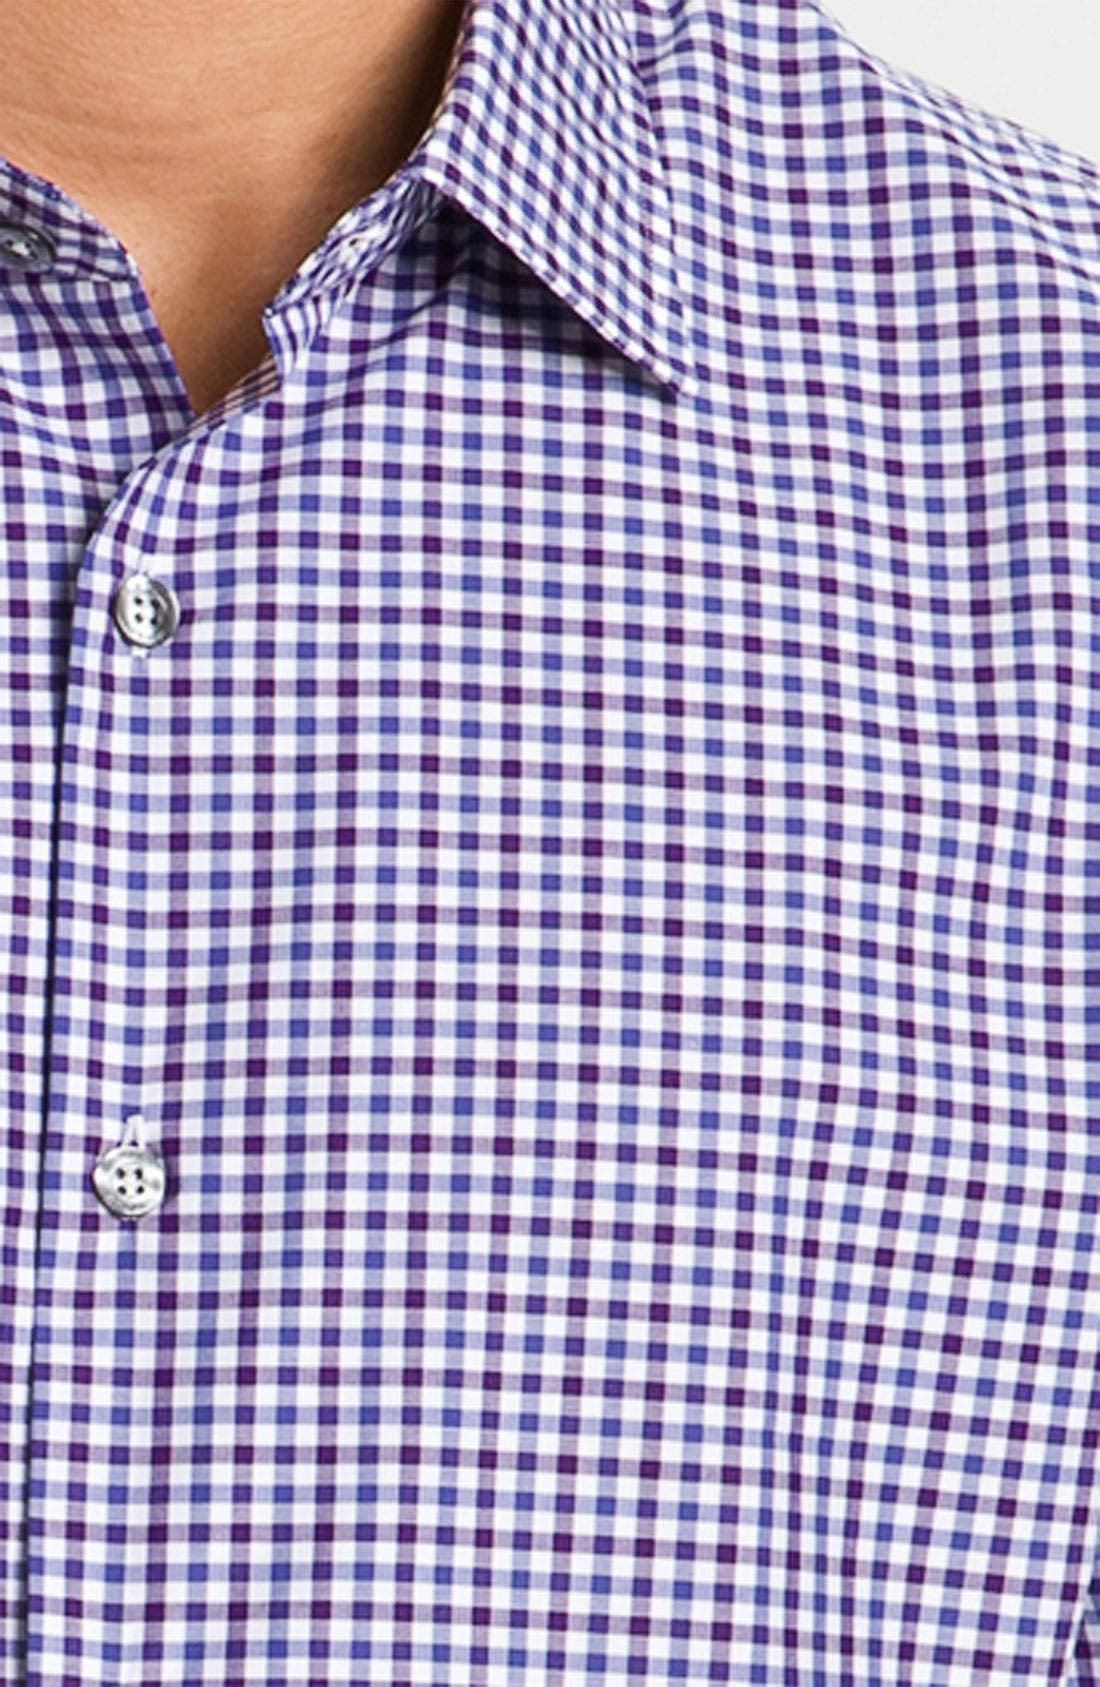 Alternate Image 3  - Paul Smith London Trim Fit Gingham Check Dress Shirt